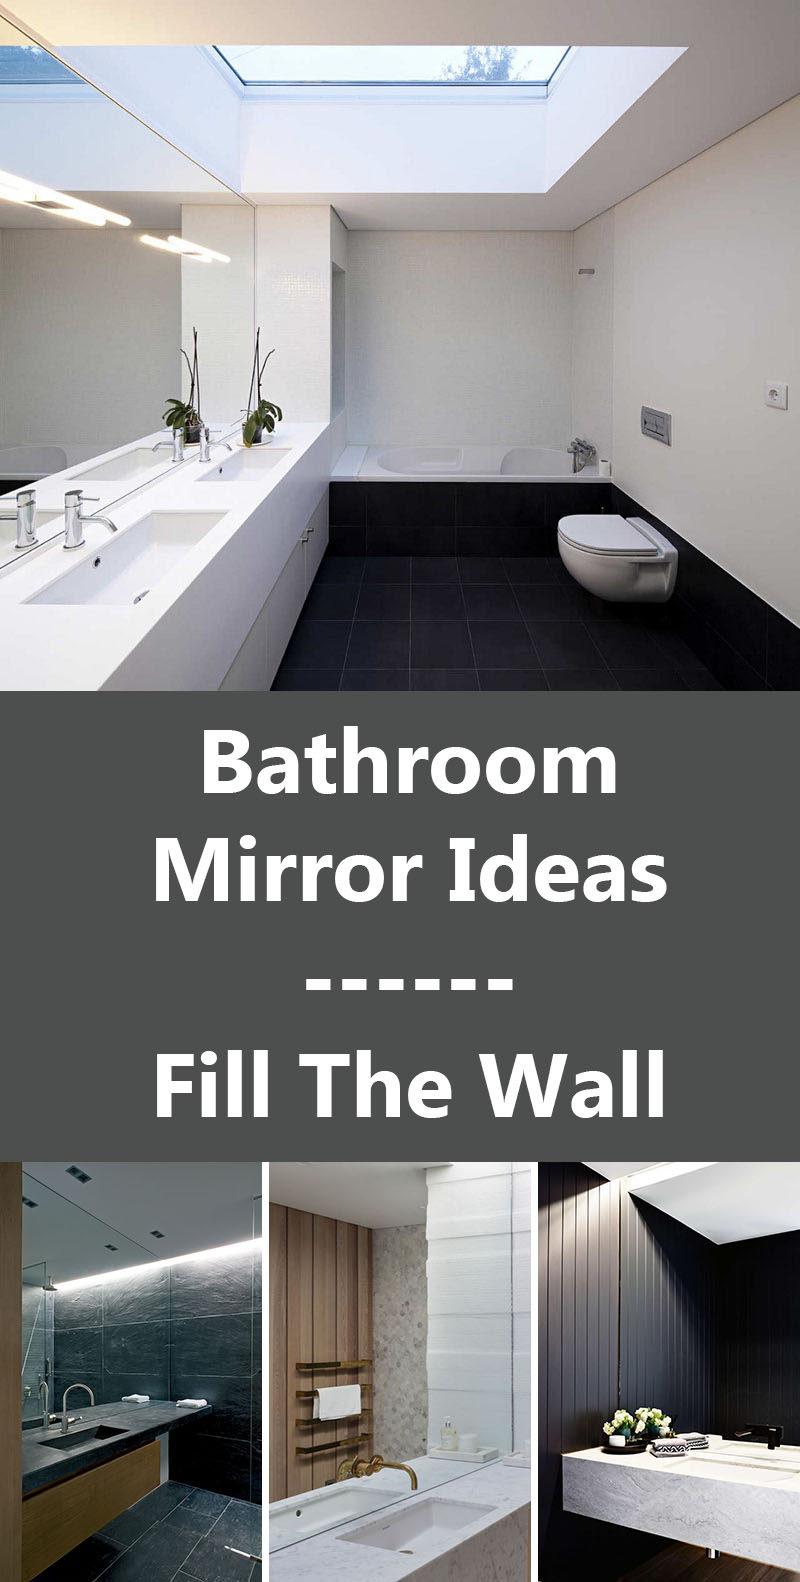 Bathroom Mirror Ideas - Fill The Wall